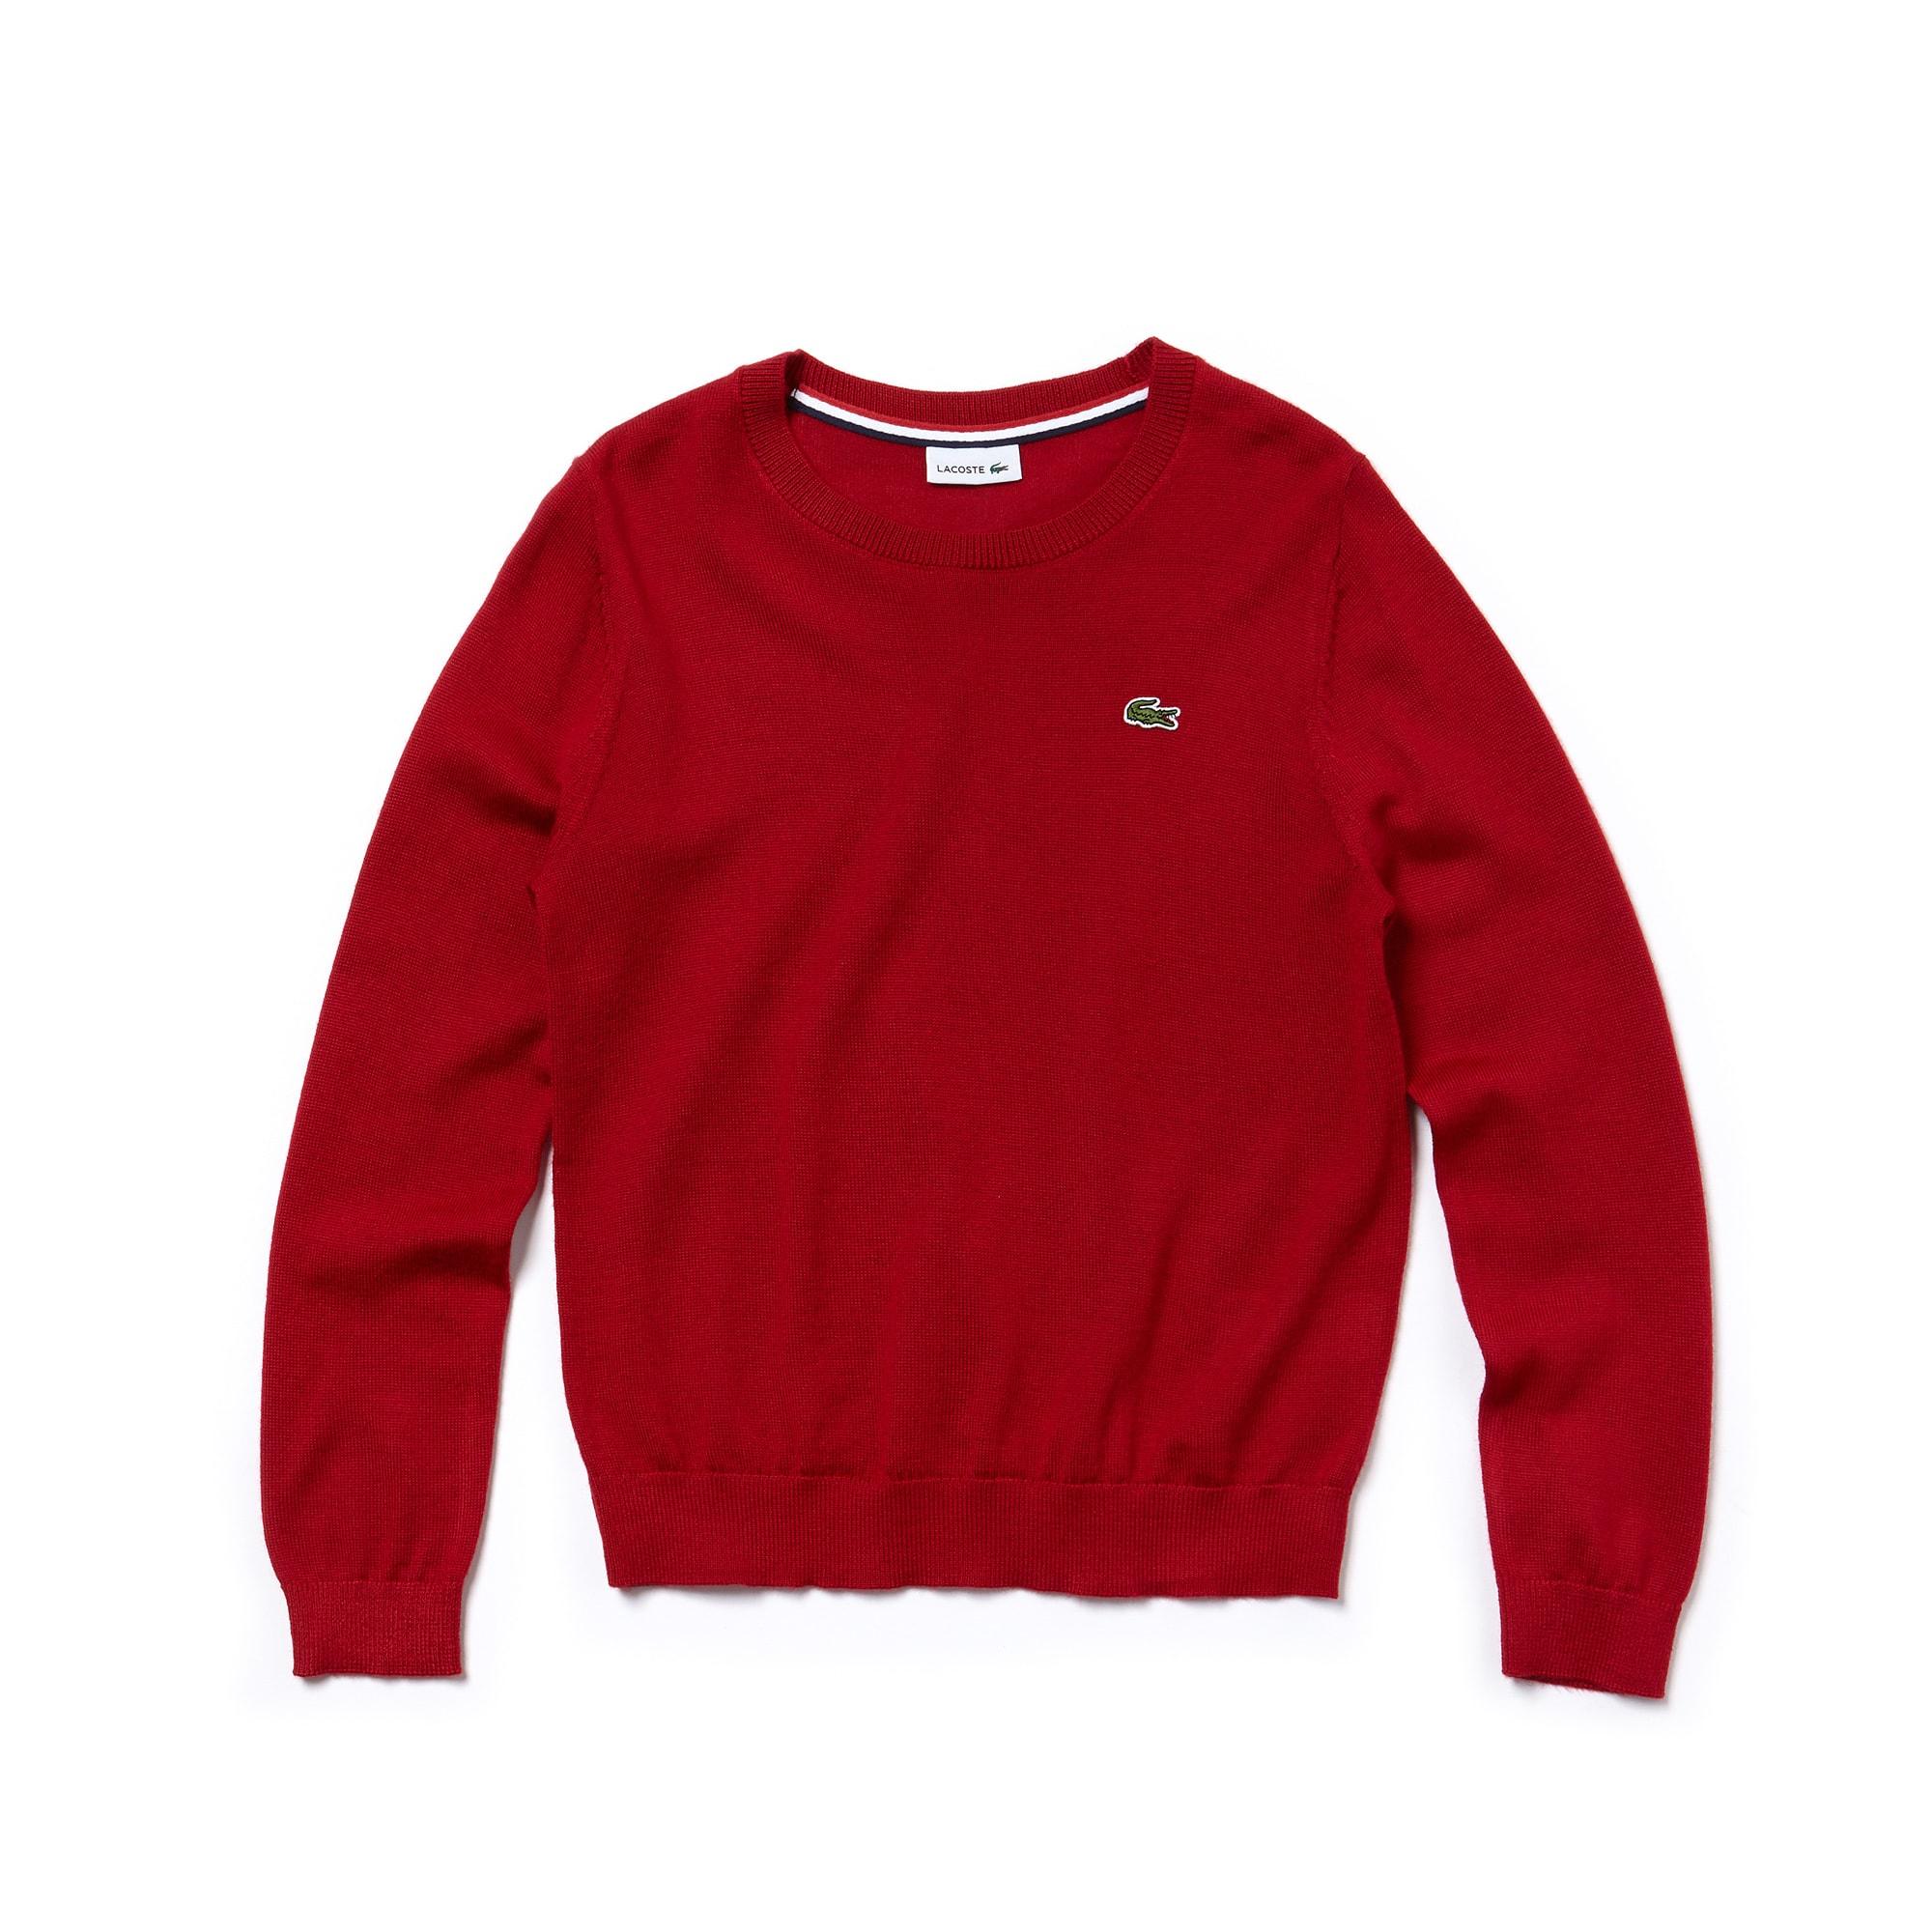 Boys' Crew Neck Wool Blend Jersey Sweater